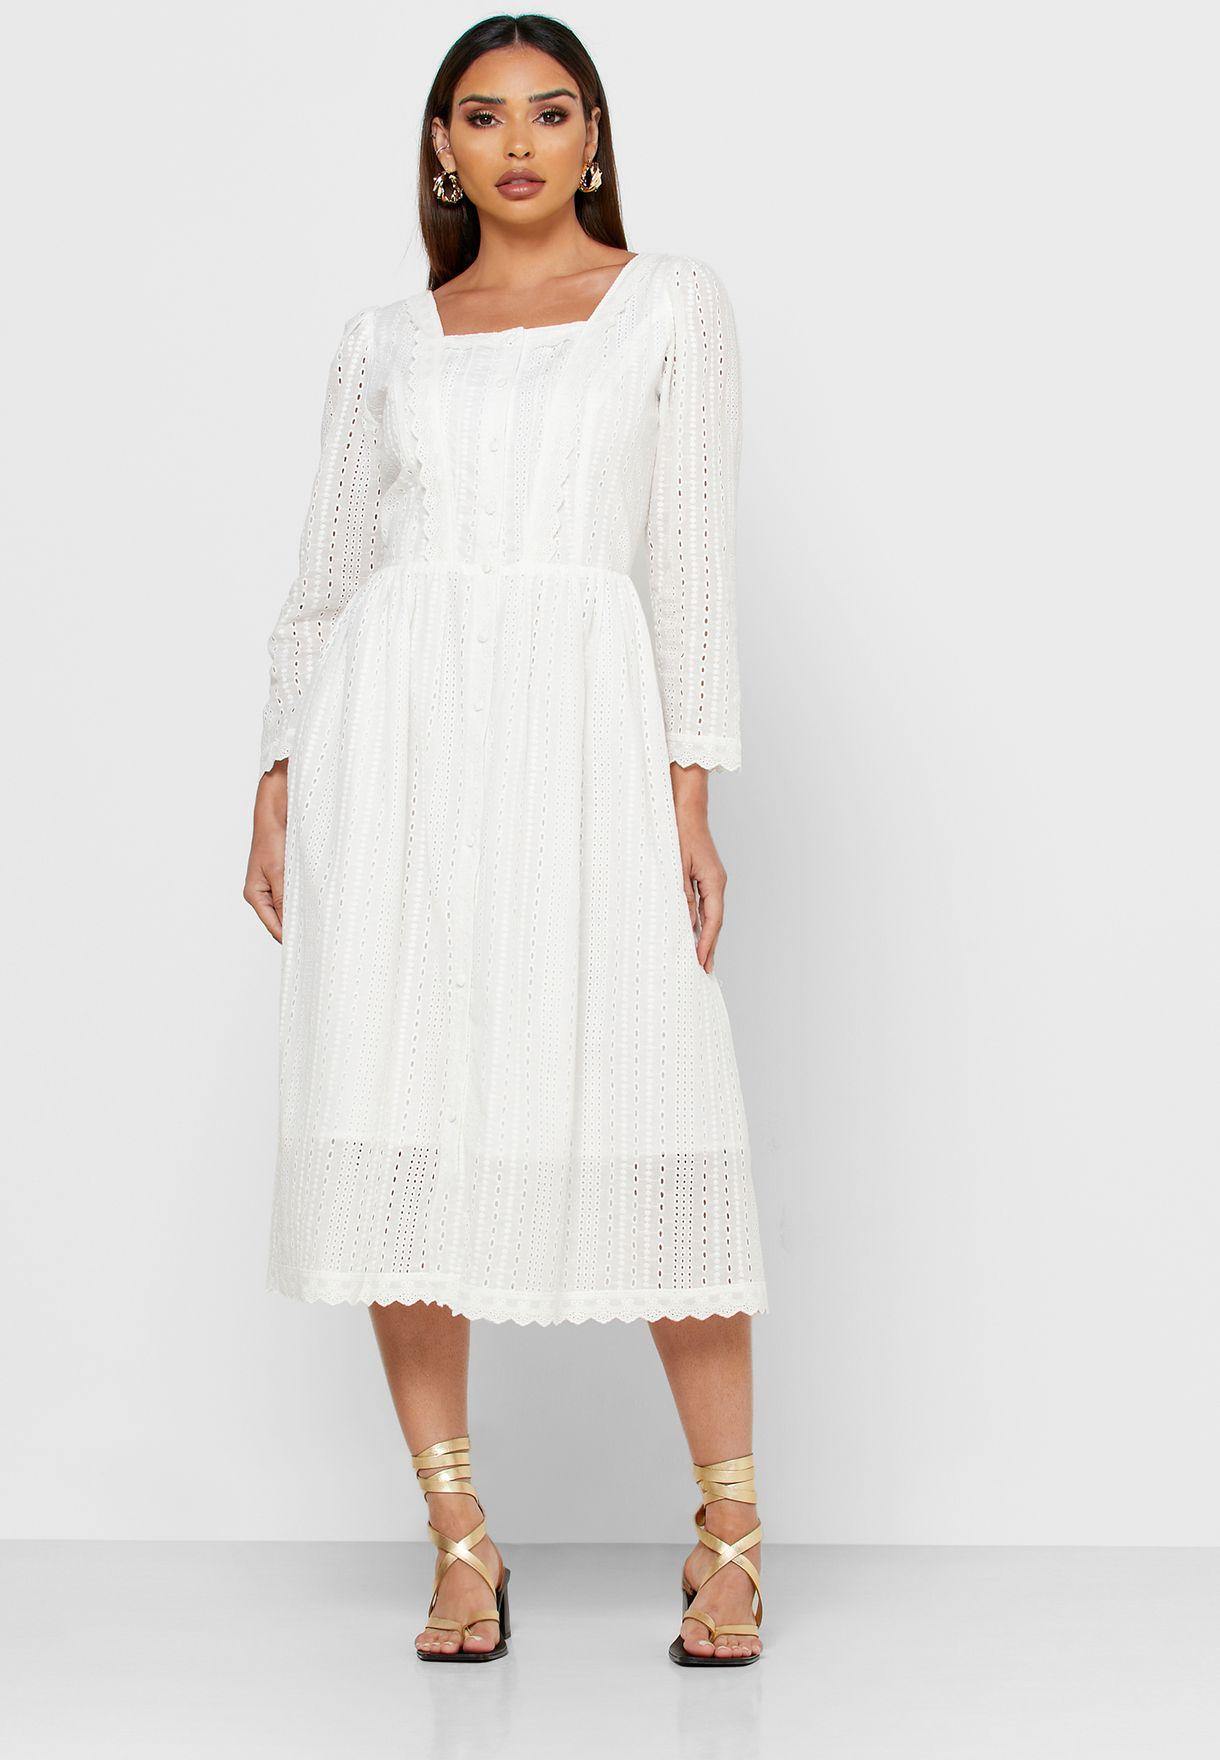 Square Neck Mesh Sleeve Dress